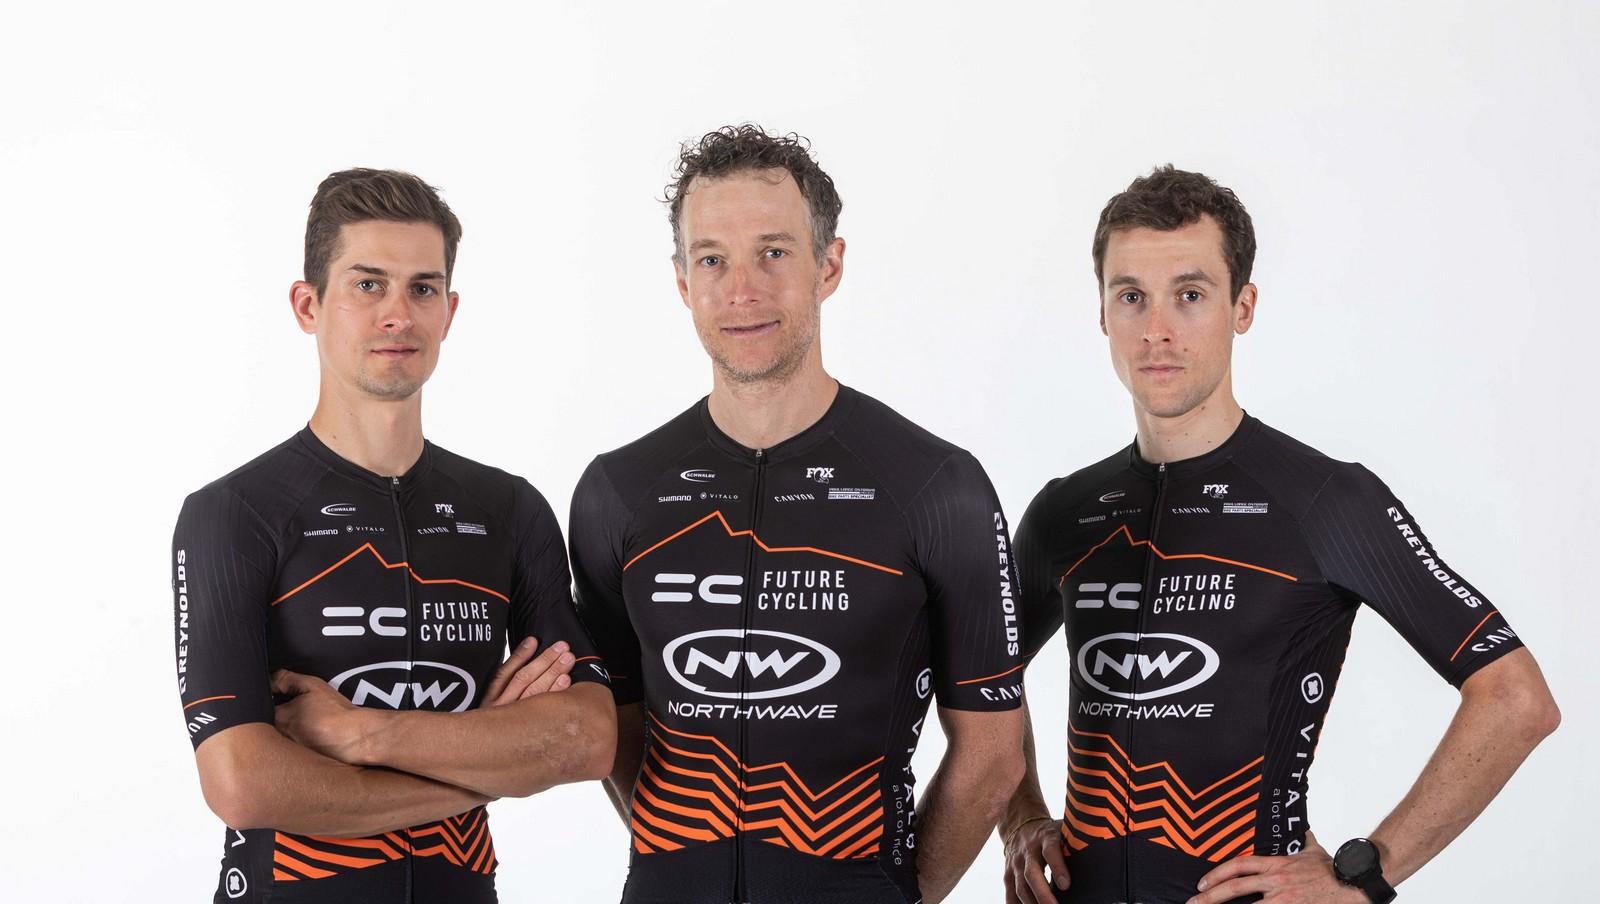 I membri del team Future Cycling - Northwave: Hynek, Stosek e Buksa